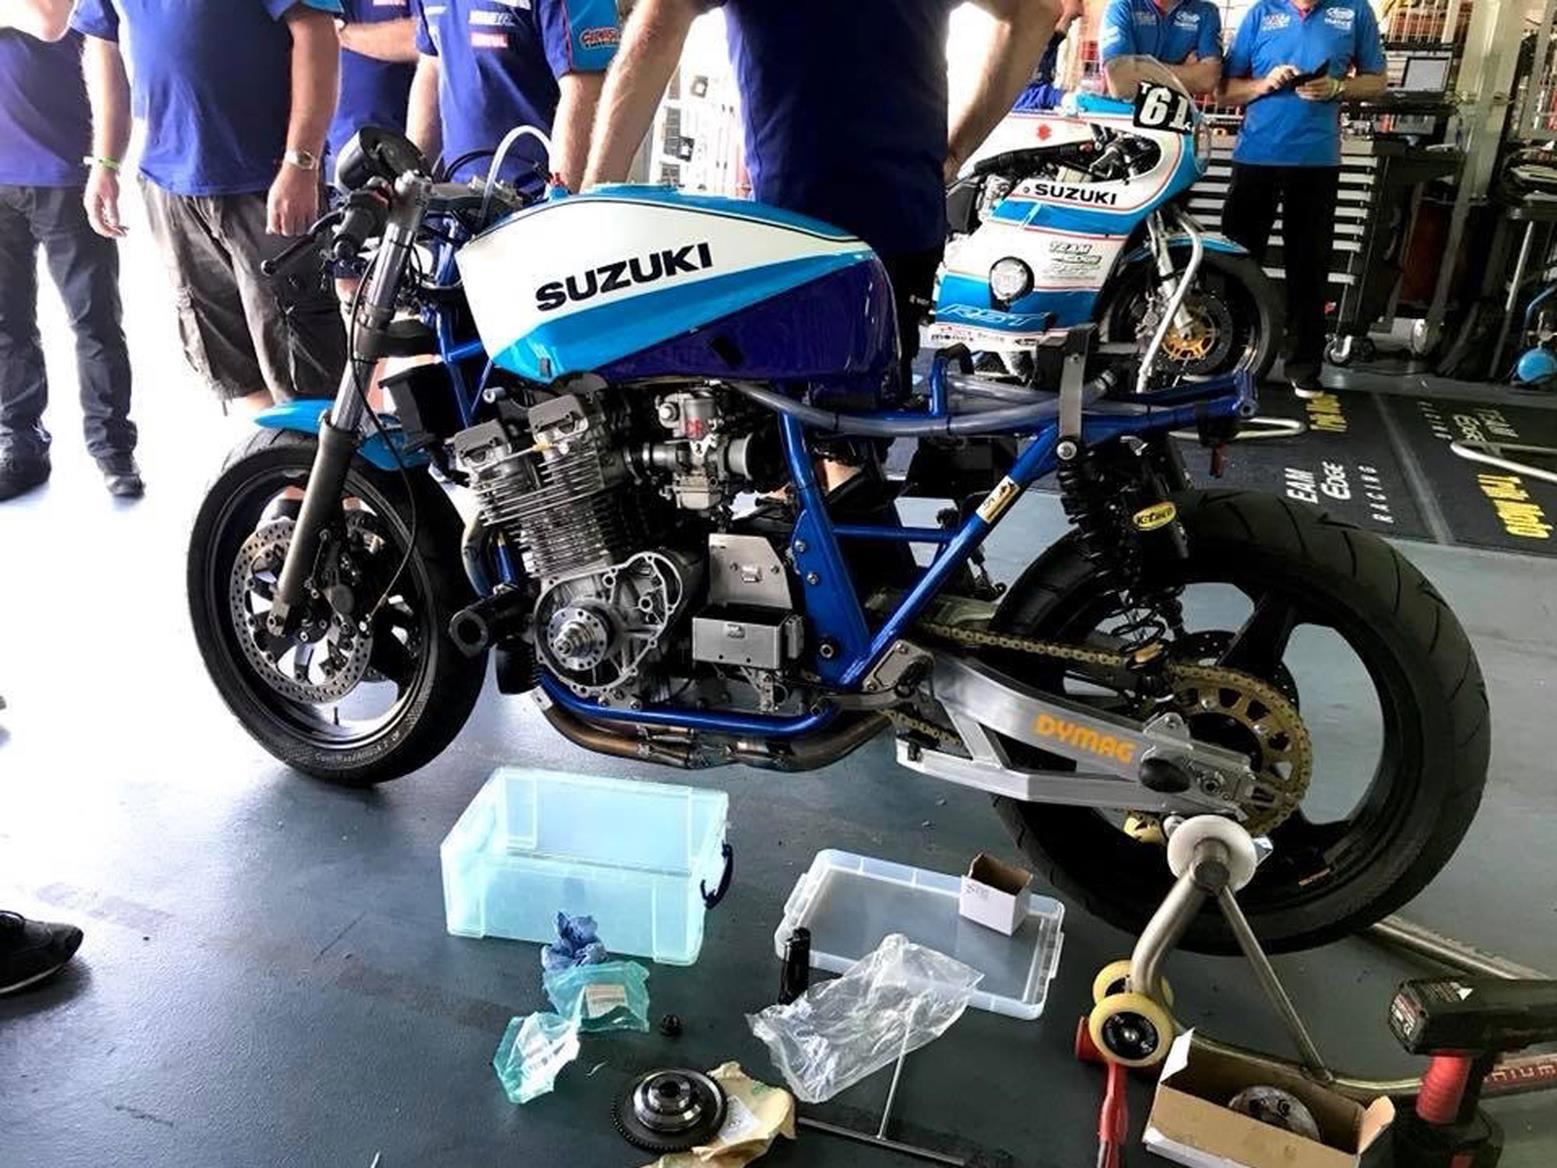 The Suzuki Katana on its paddock stand